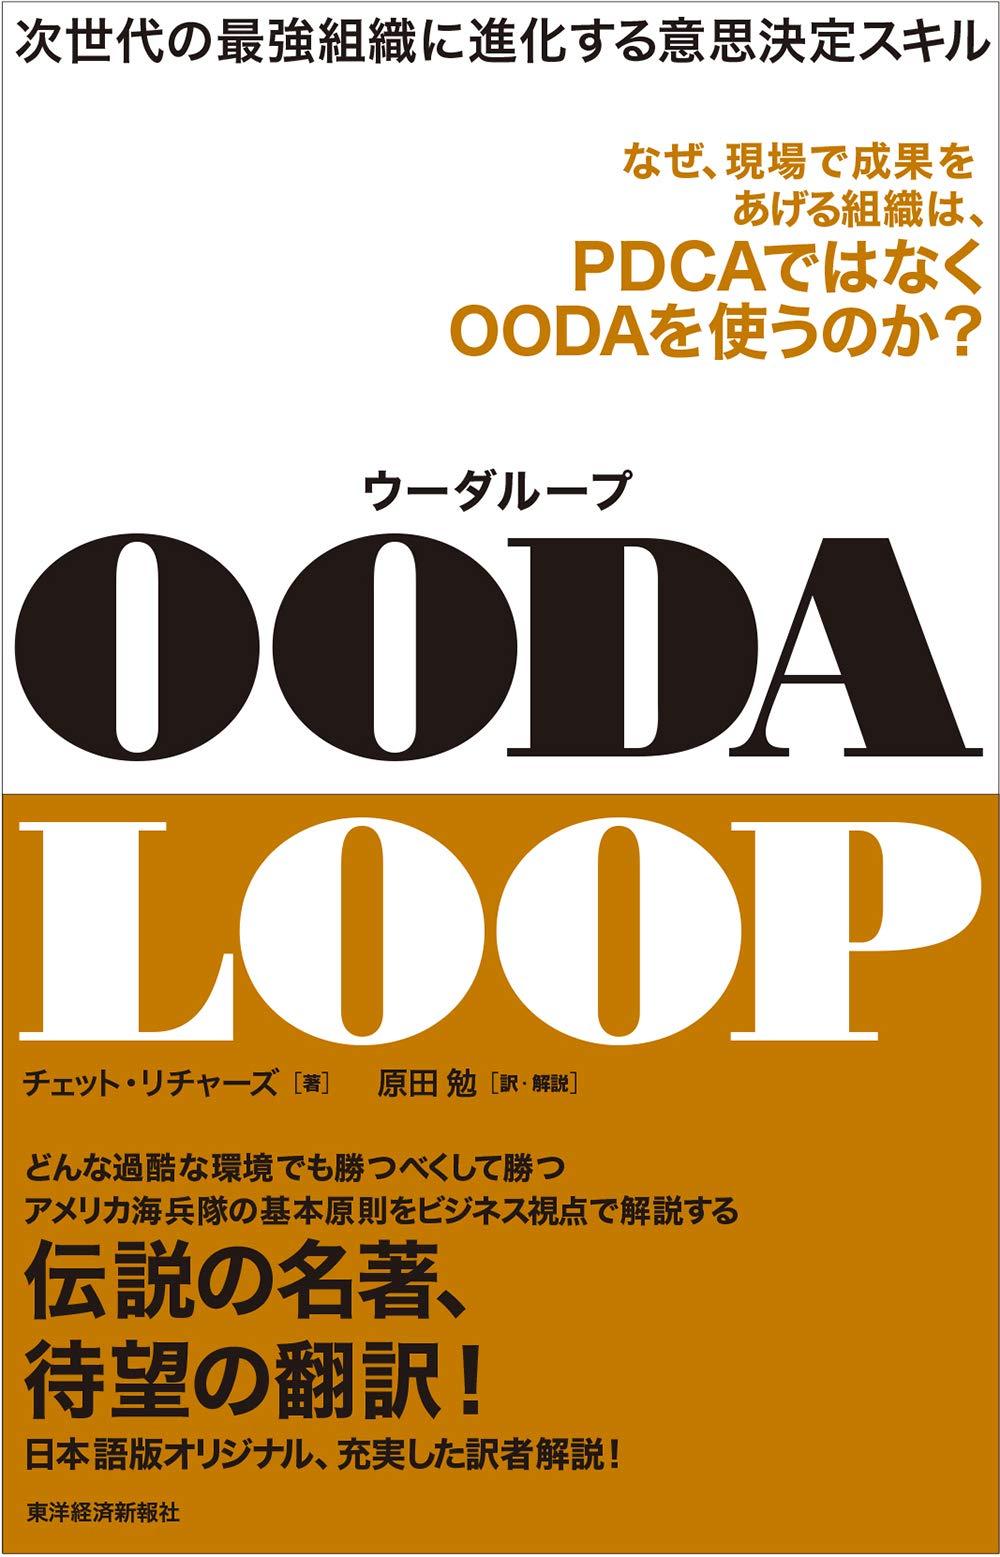 OODA LOOP(ウーダループ) | チェット リチャーズ, 原田 勉 |本 | 通販 | Amazon